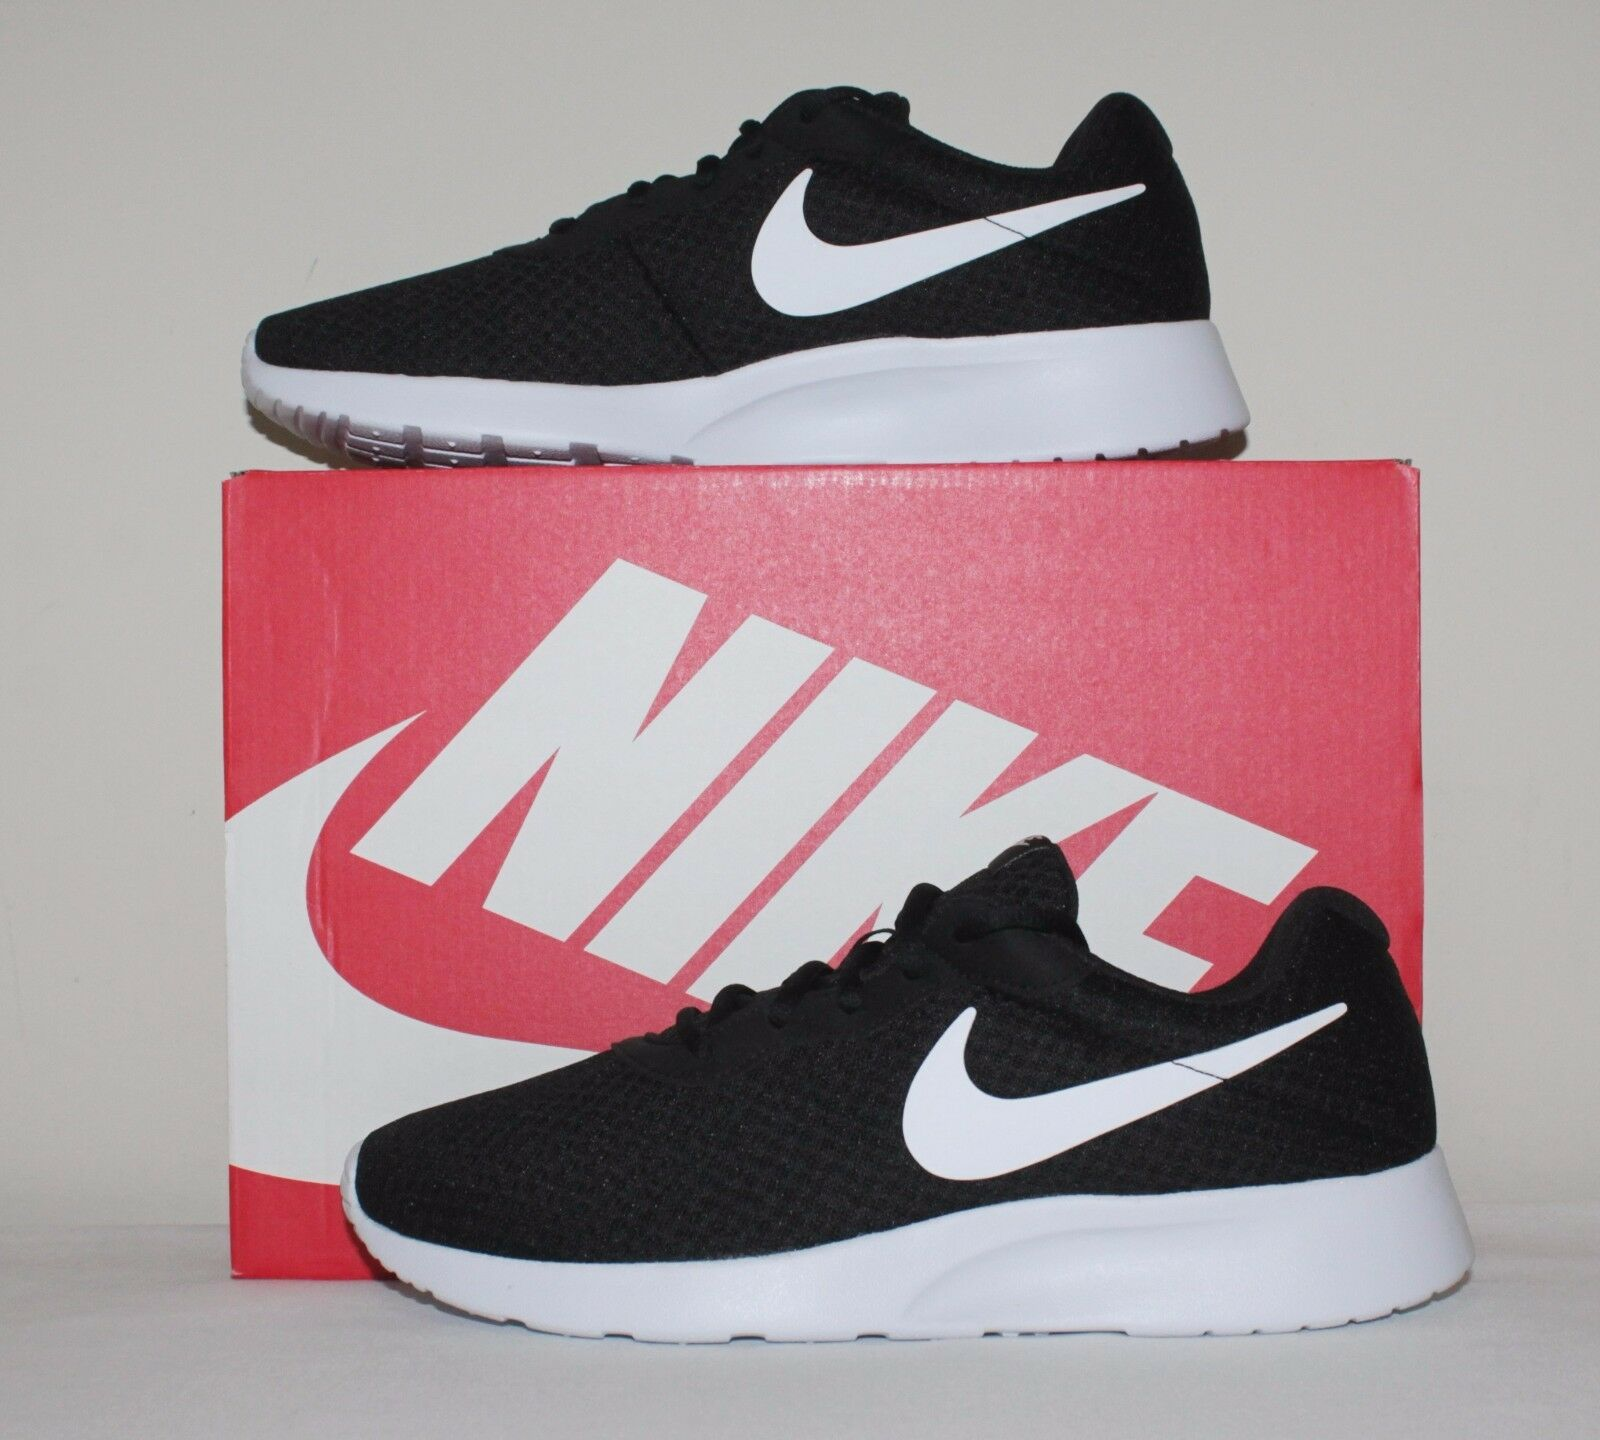 Zapatillas Zapatos Para Correr Nike Hombres Tanjun tamaño 7.5, con 8, 9.5, 10 Nuevo con 7.5, Caja 812654 011 051201